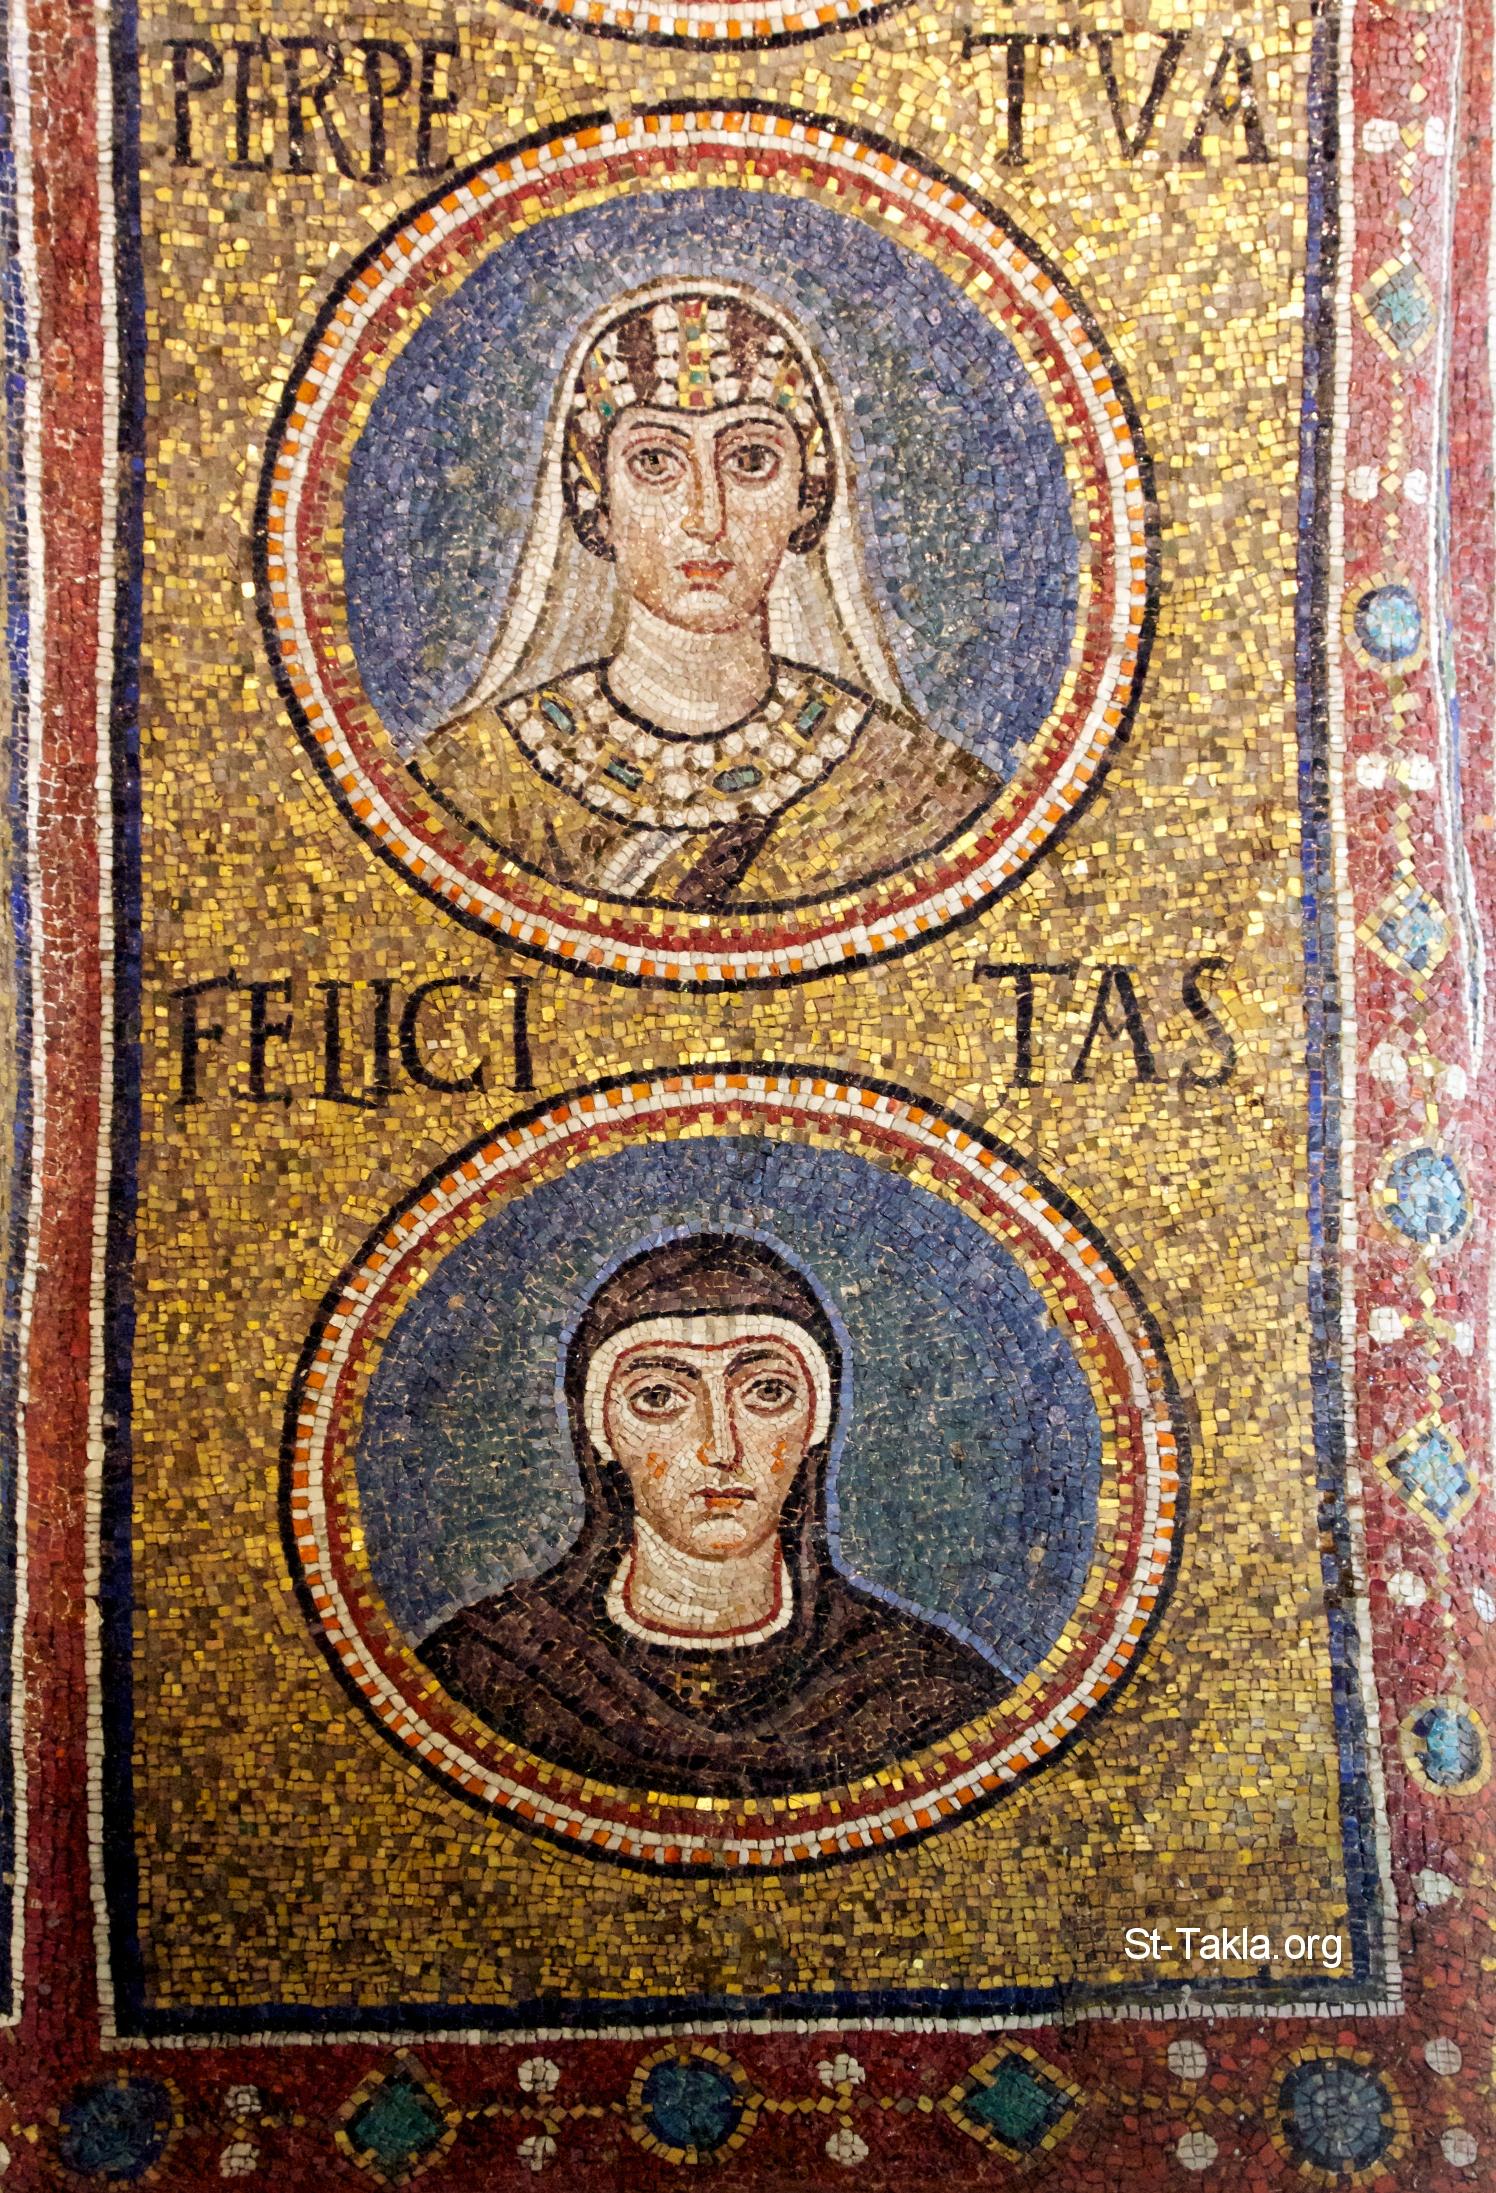 Mosaic: Saints Perpetua and Felicity